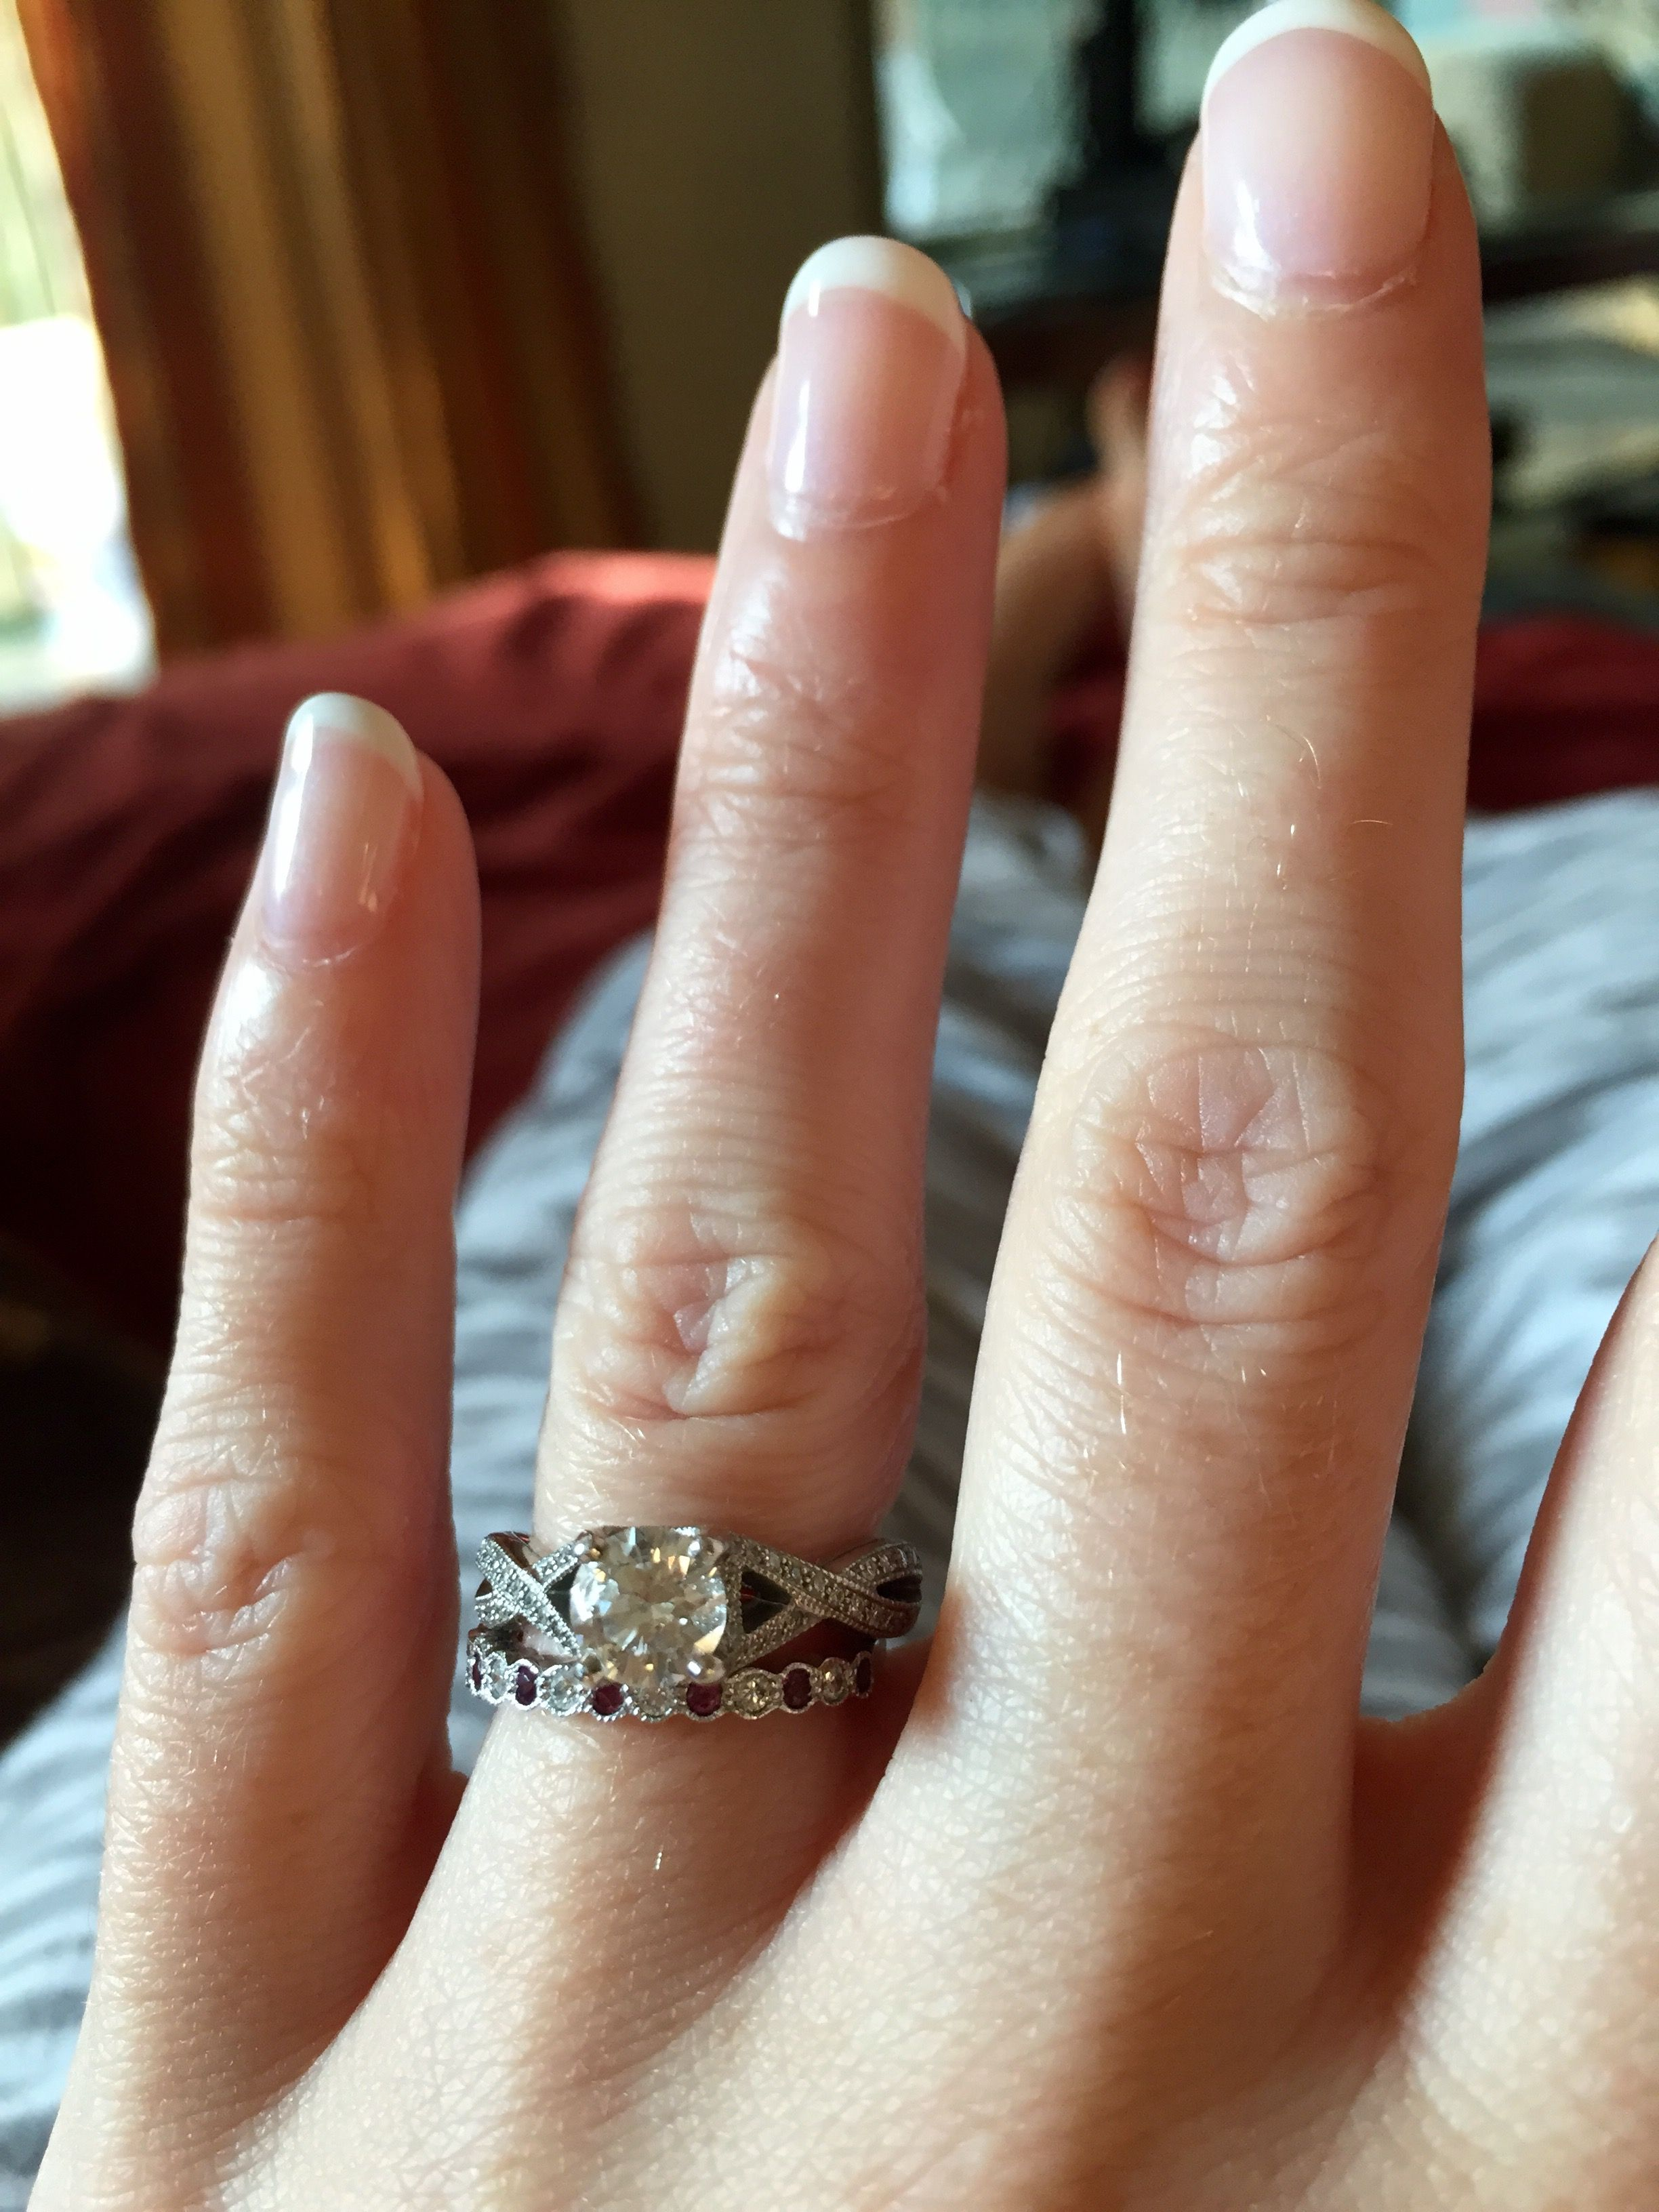 Infinity Twist Engagement Ring Eternity Straight Alternating Garnet And Diamond Wedding Band Le Diamond Wedding Bands Engagement Rings Twisted Boston Jewelry